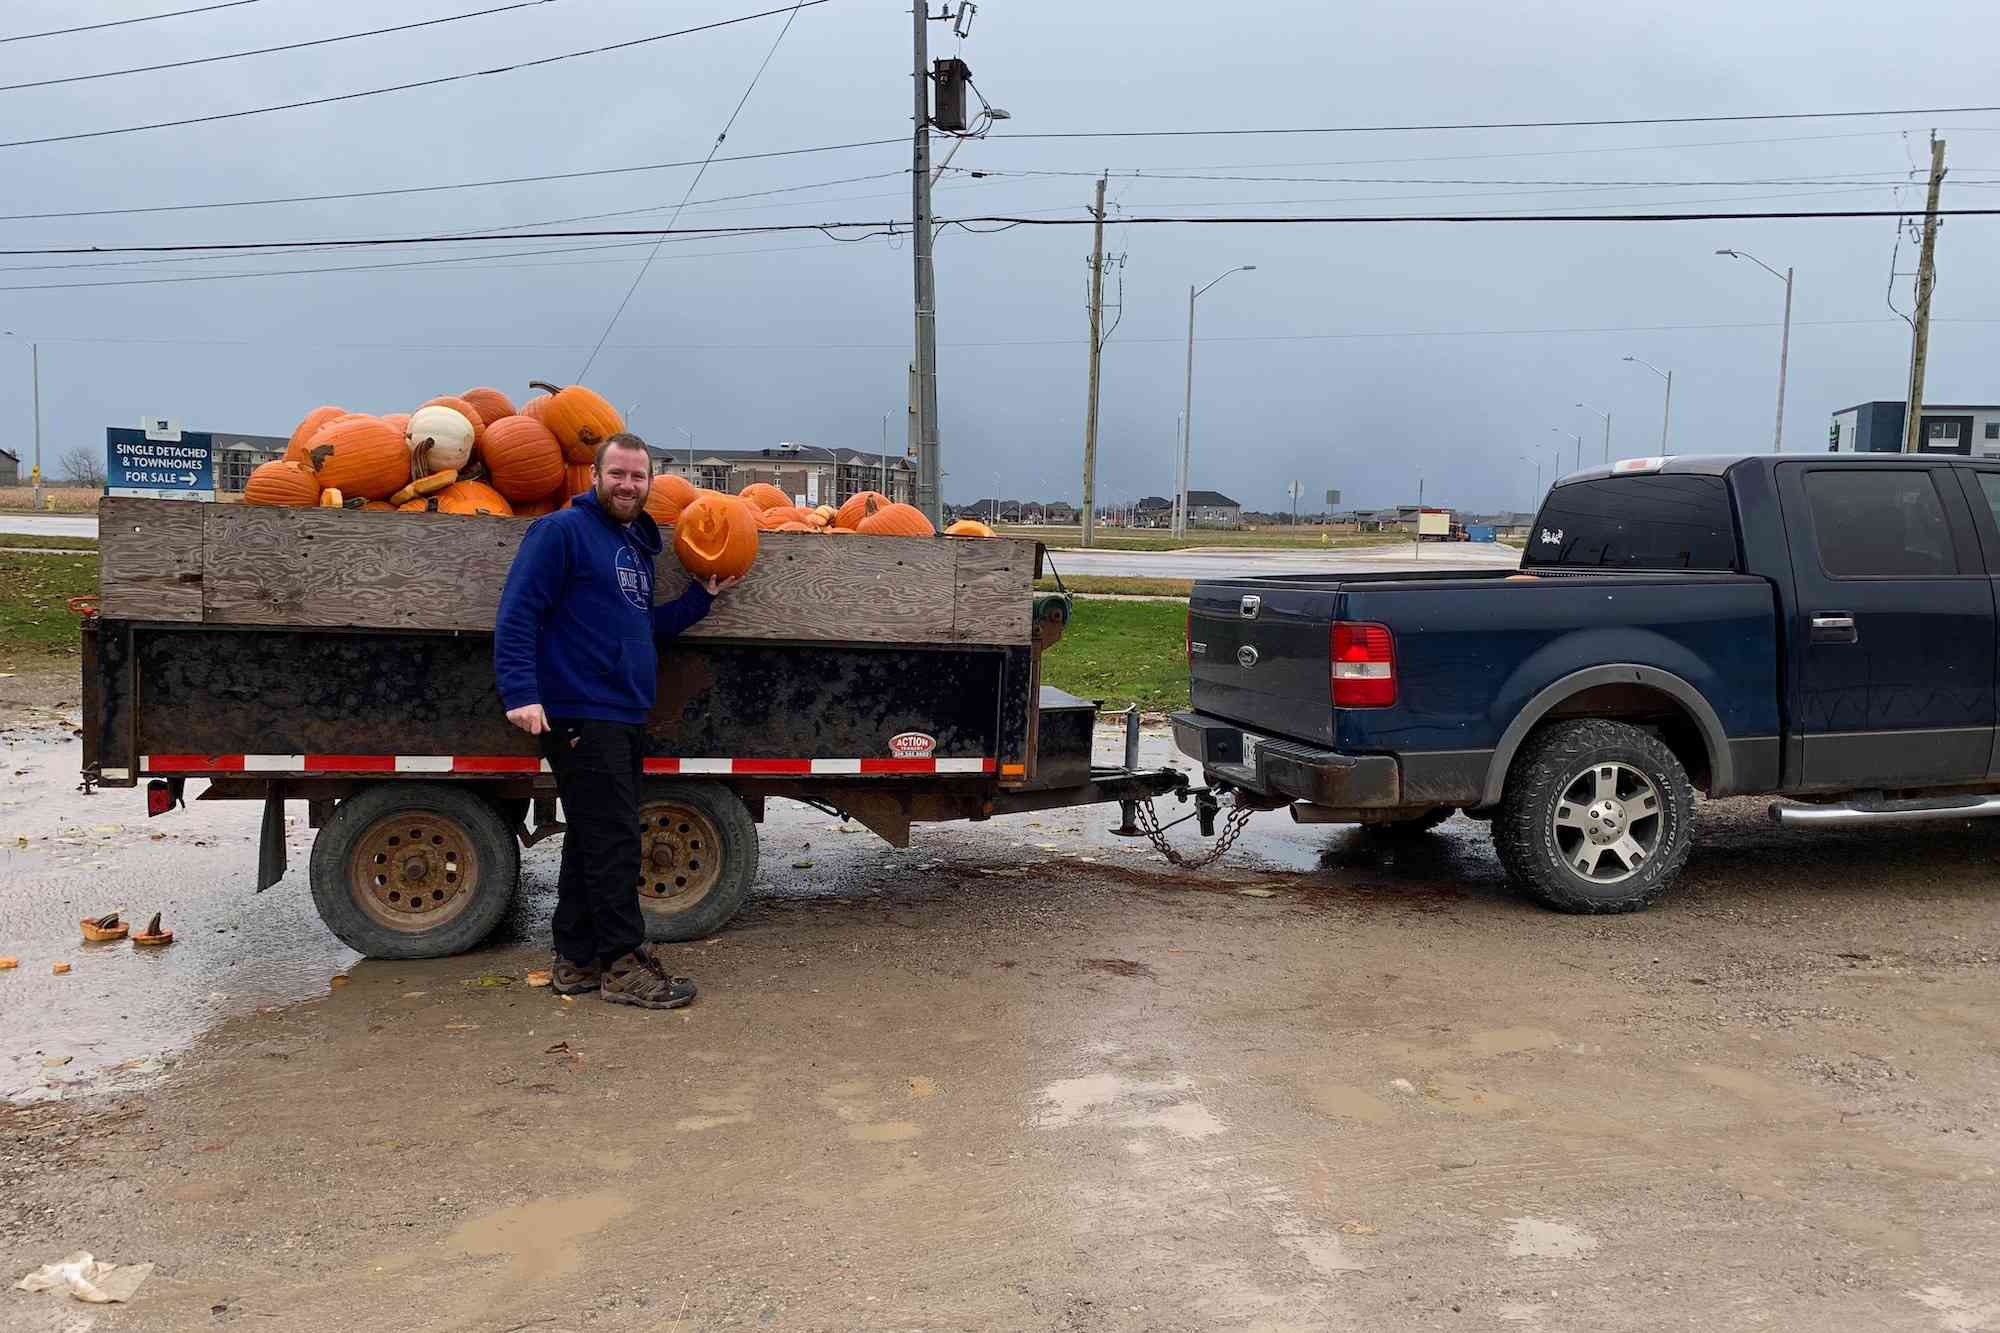 trailer full of pumpkins